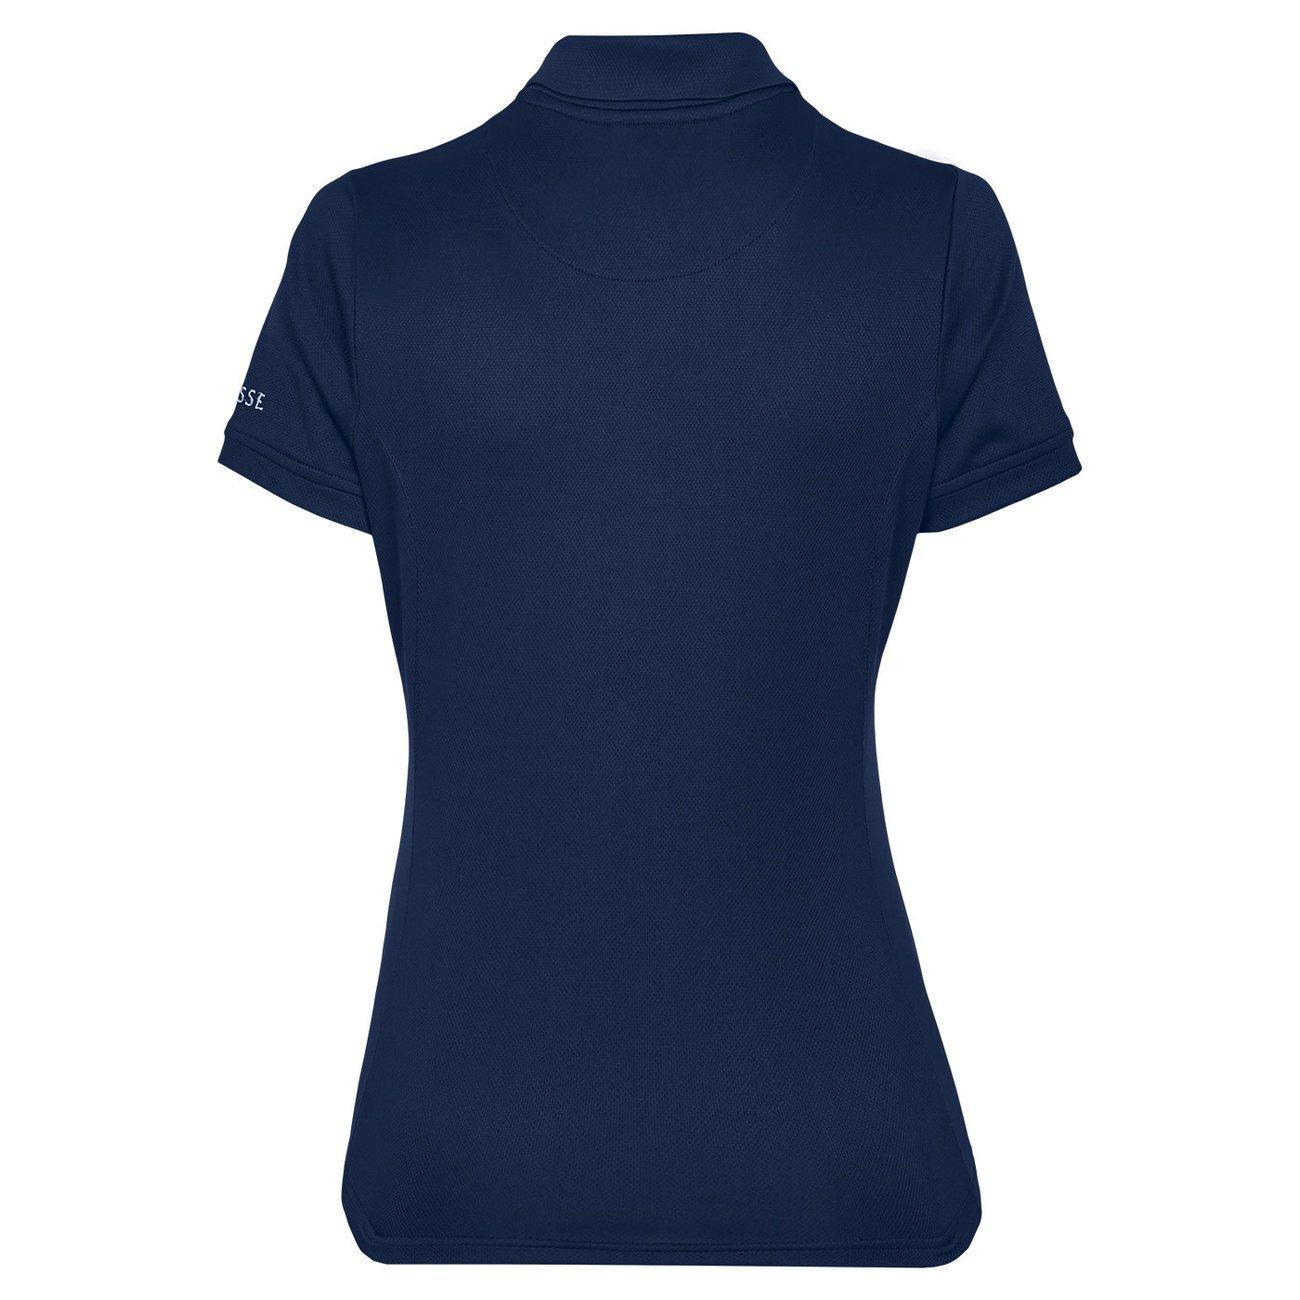 BUSSE Polo Shirt Crew, Bild 3